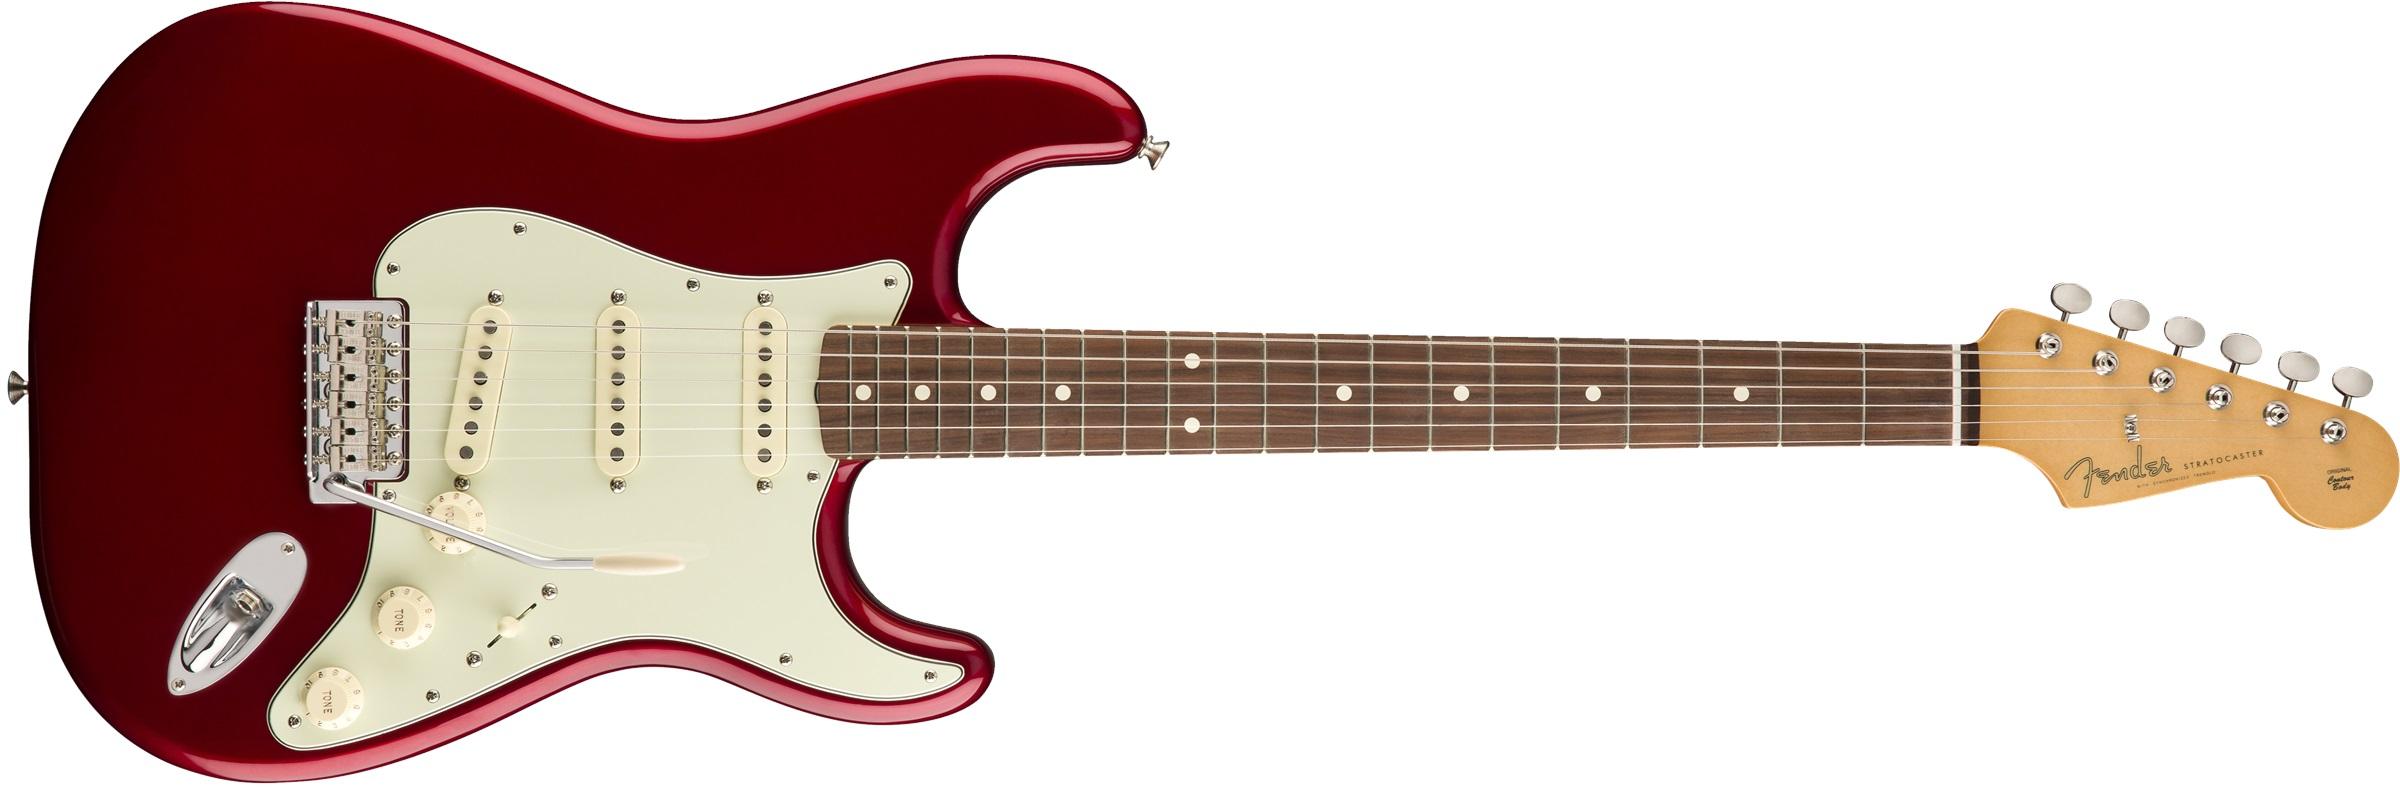 Fender 60s Stratocaster PF CAR